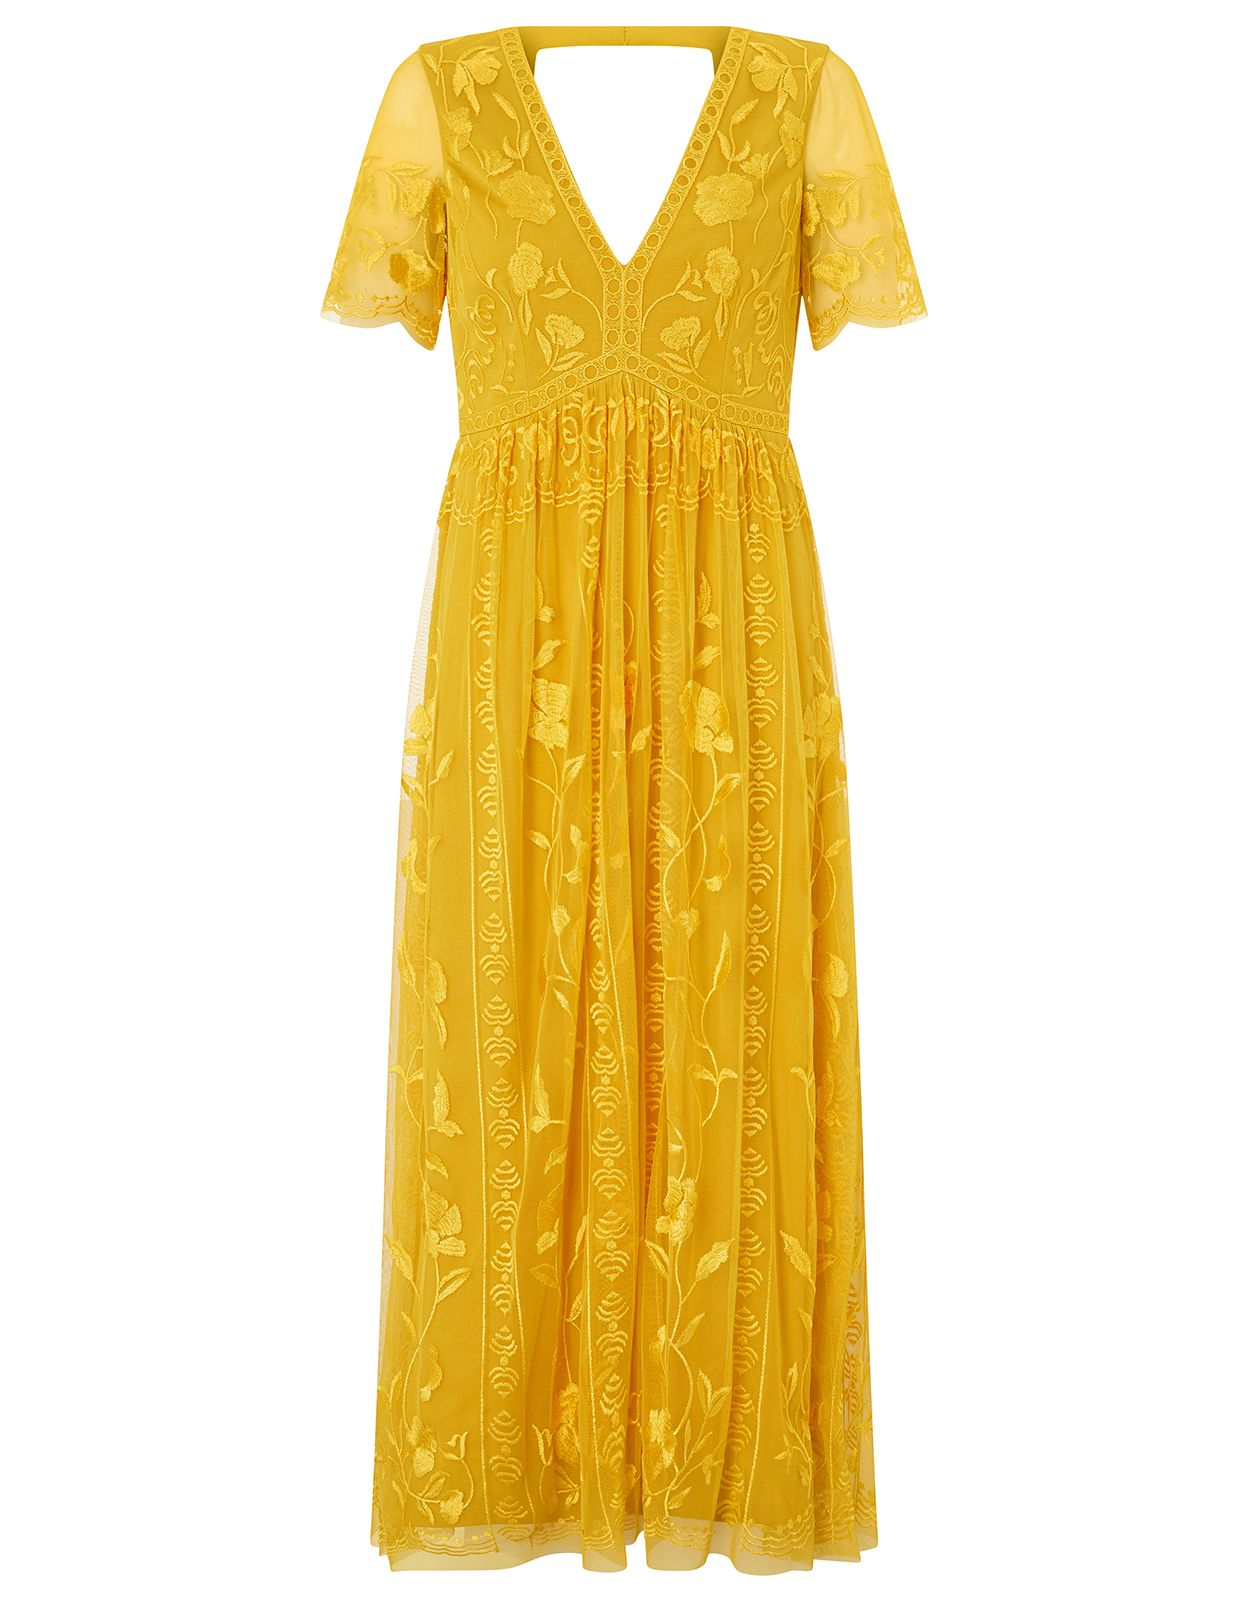 32 Beautiful Summer Wedding Guest Dresses For 2020 Embroidered Midi Dress Yellow Midi Dress Wedding Guest Dress Summer,Nordstrom Wedding Guest Dresses Sale